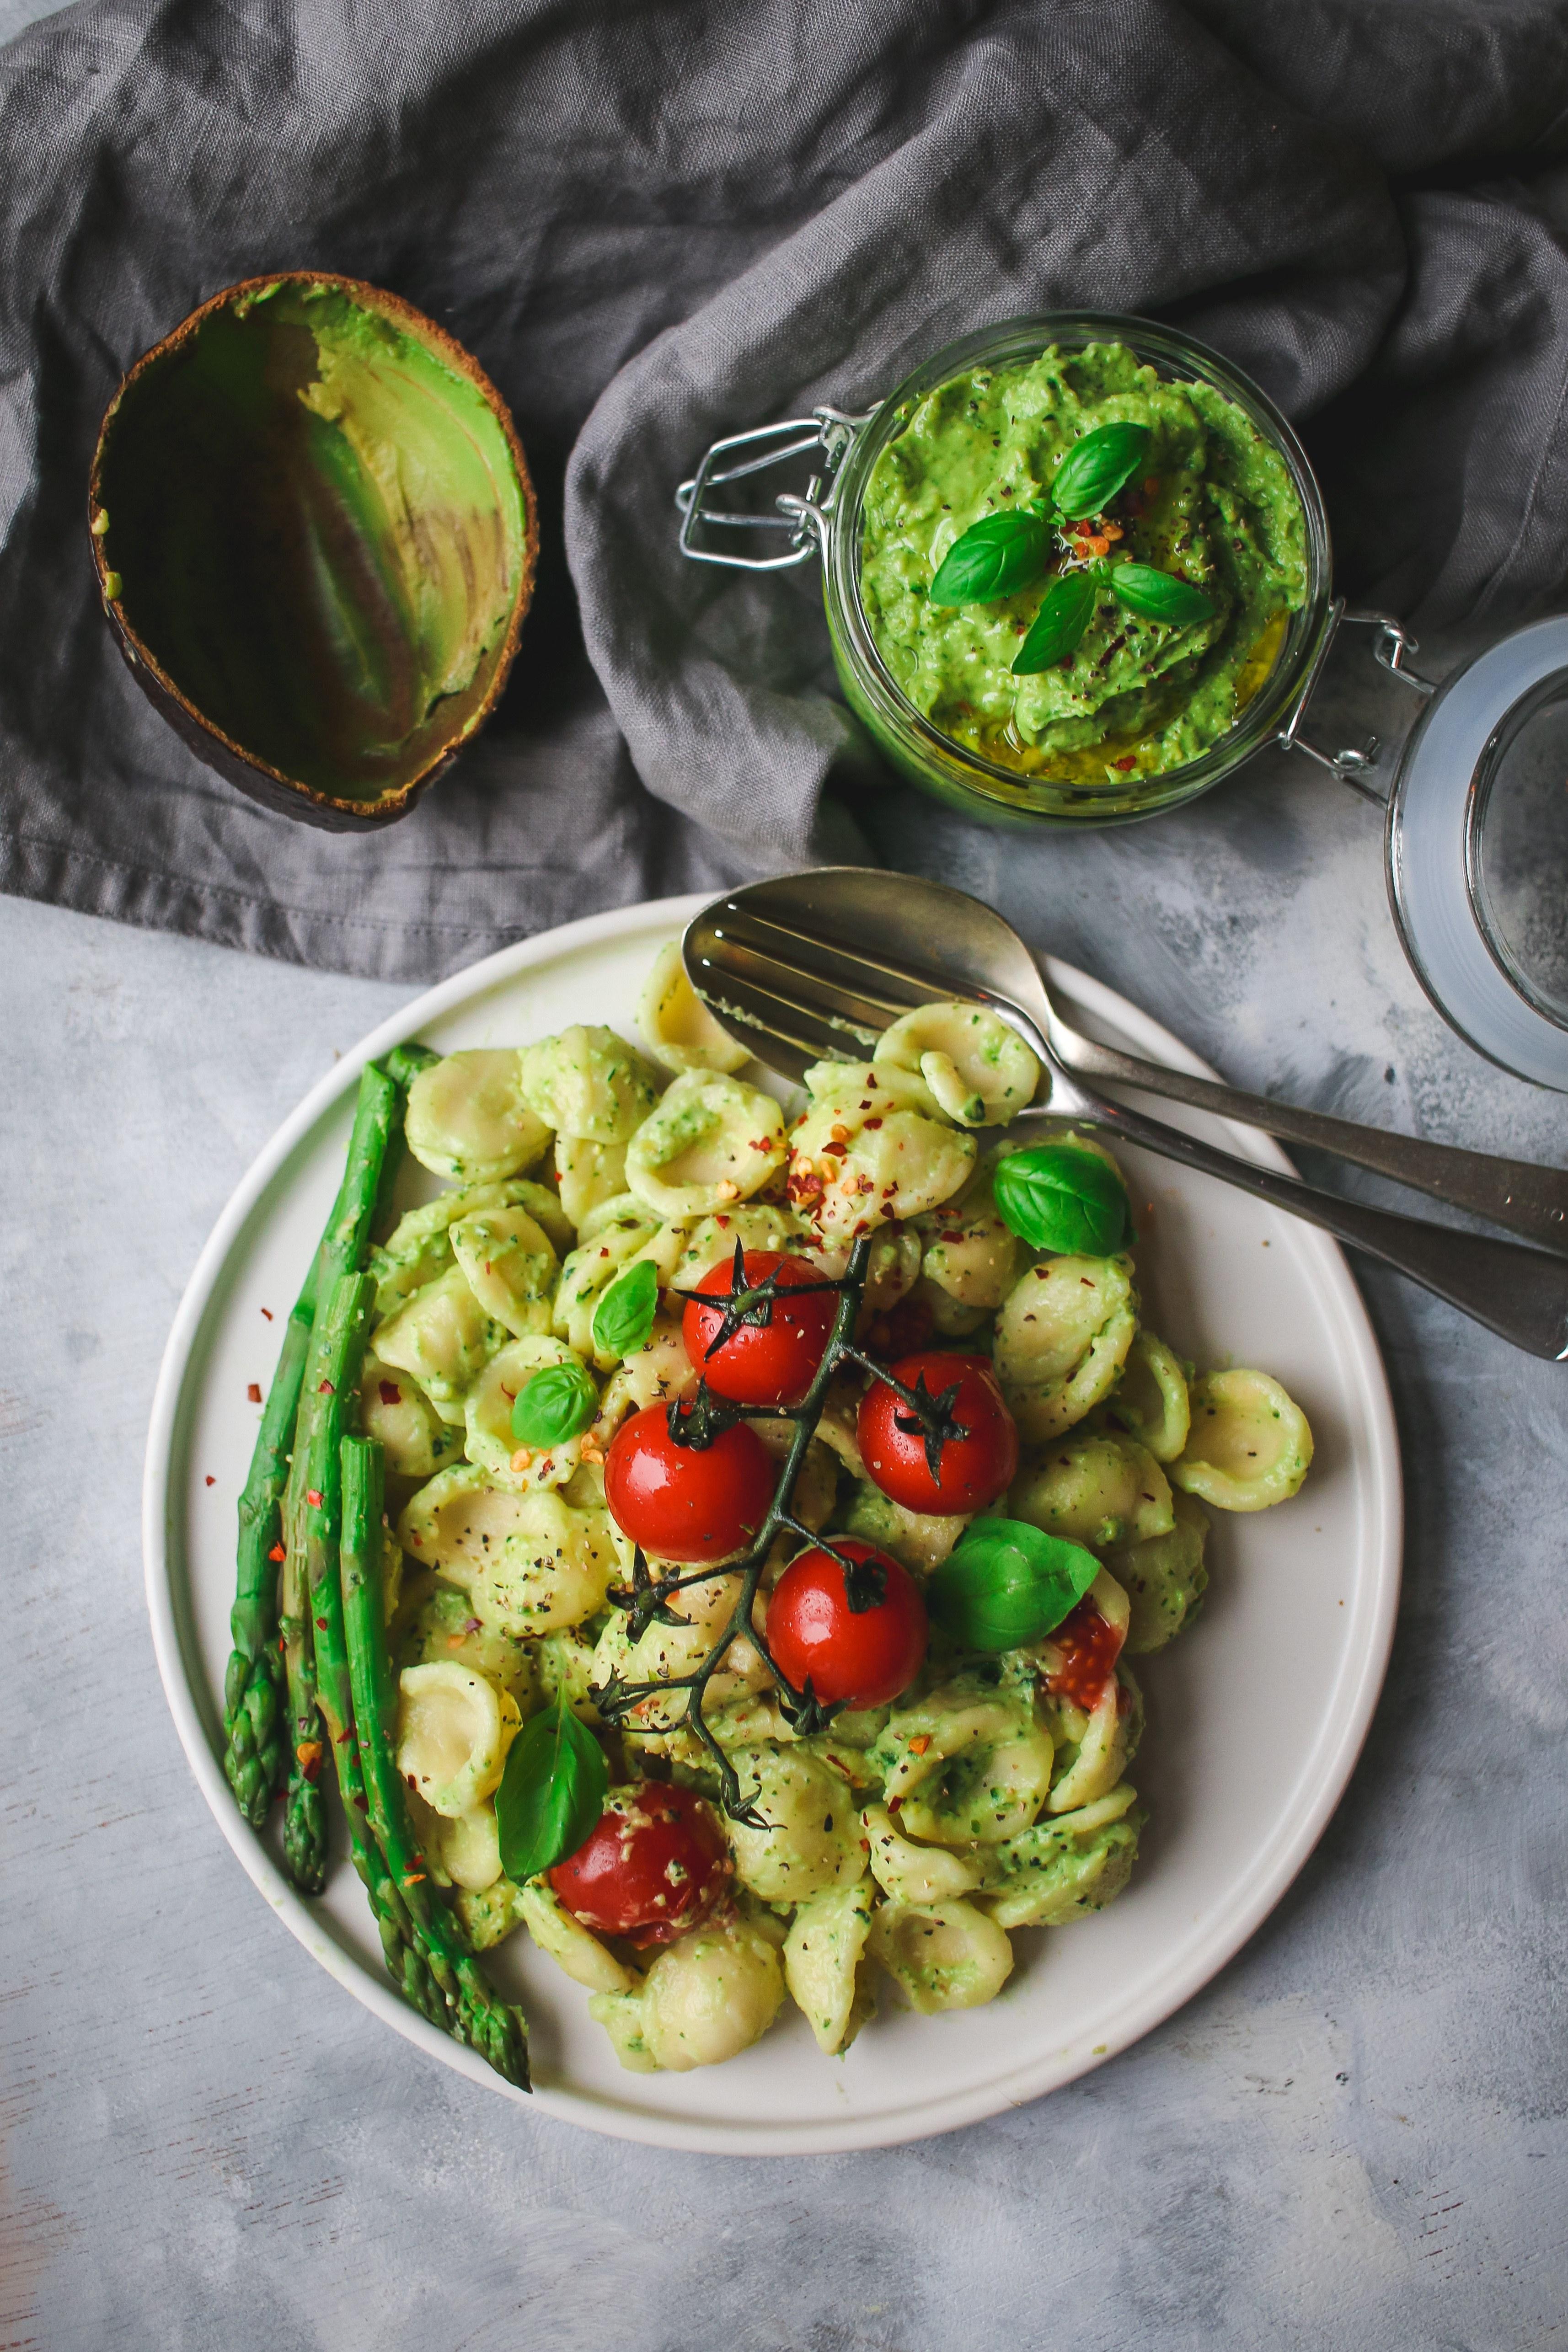 avocado and basil pesto recipe